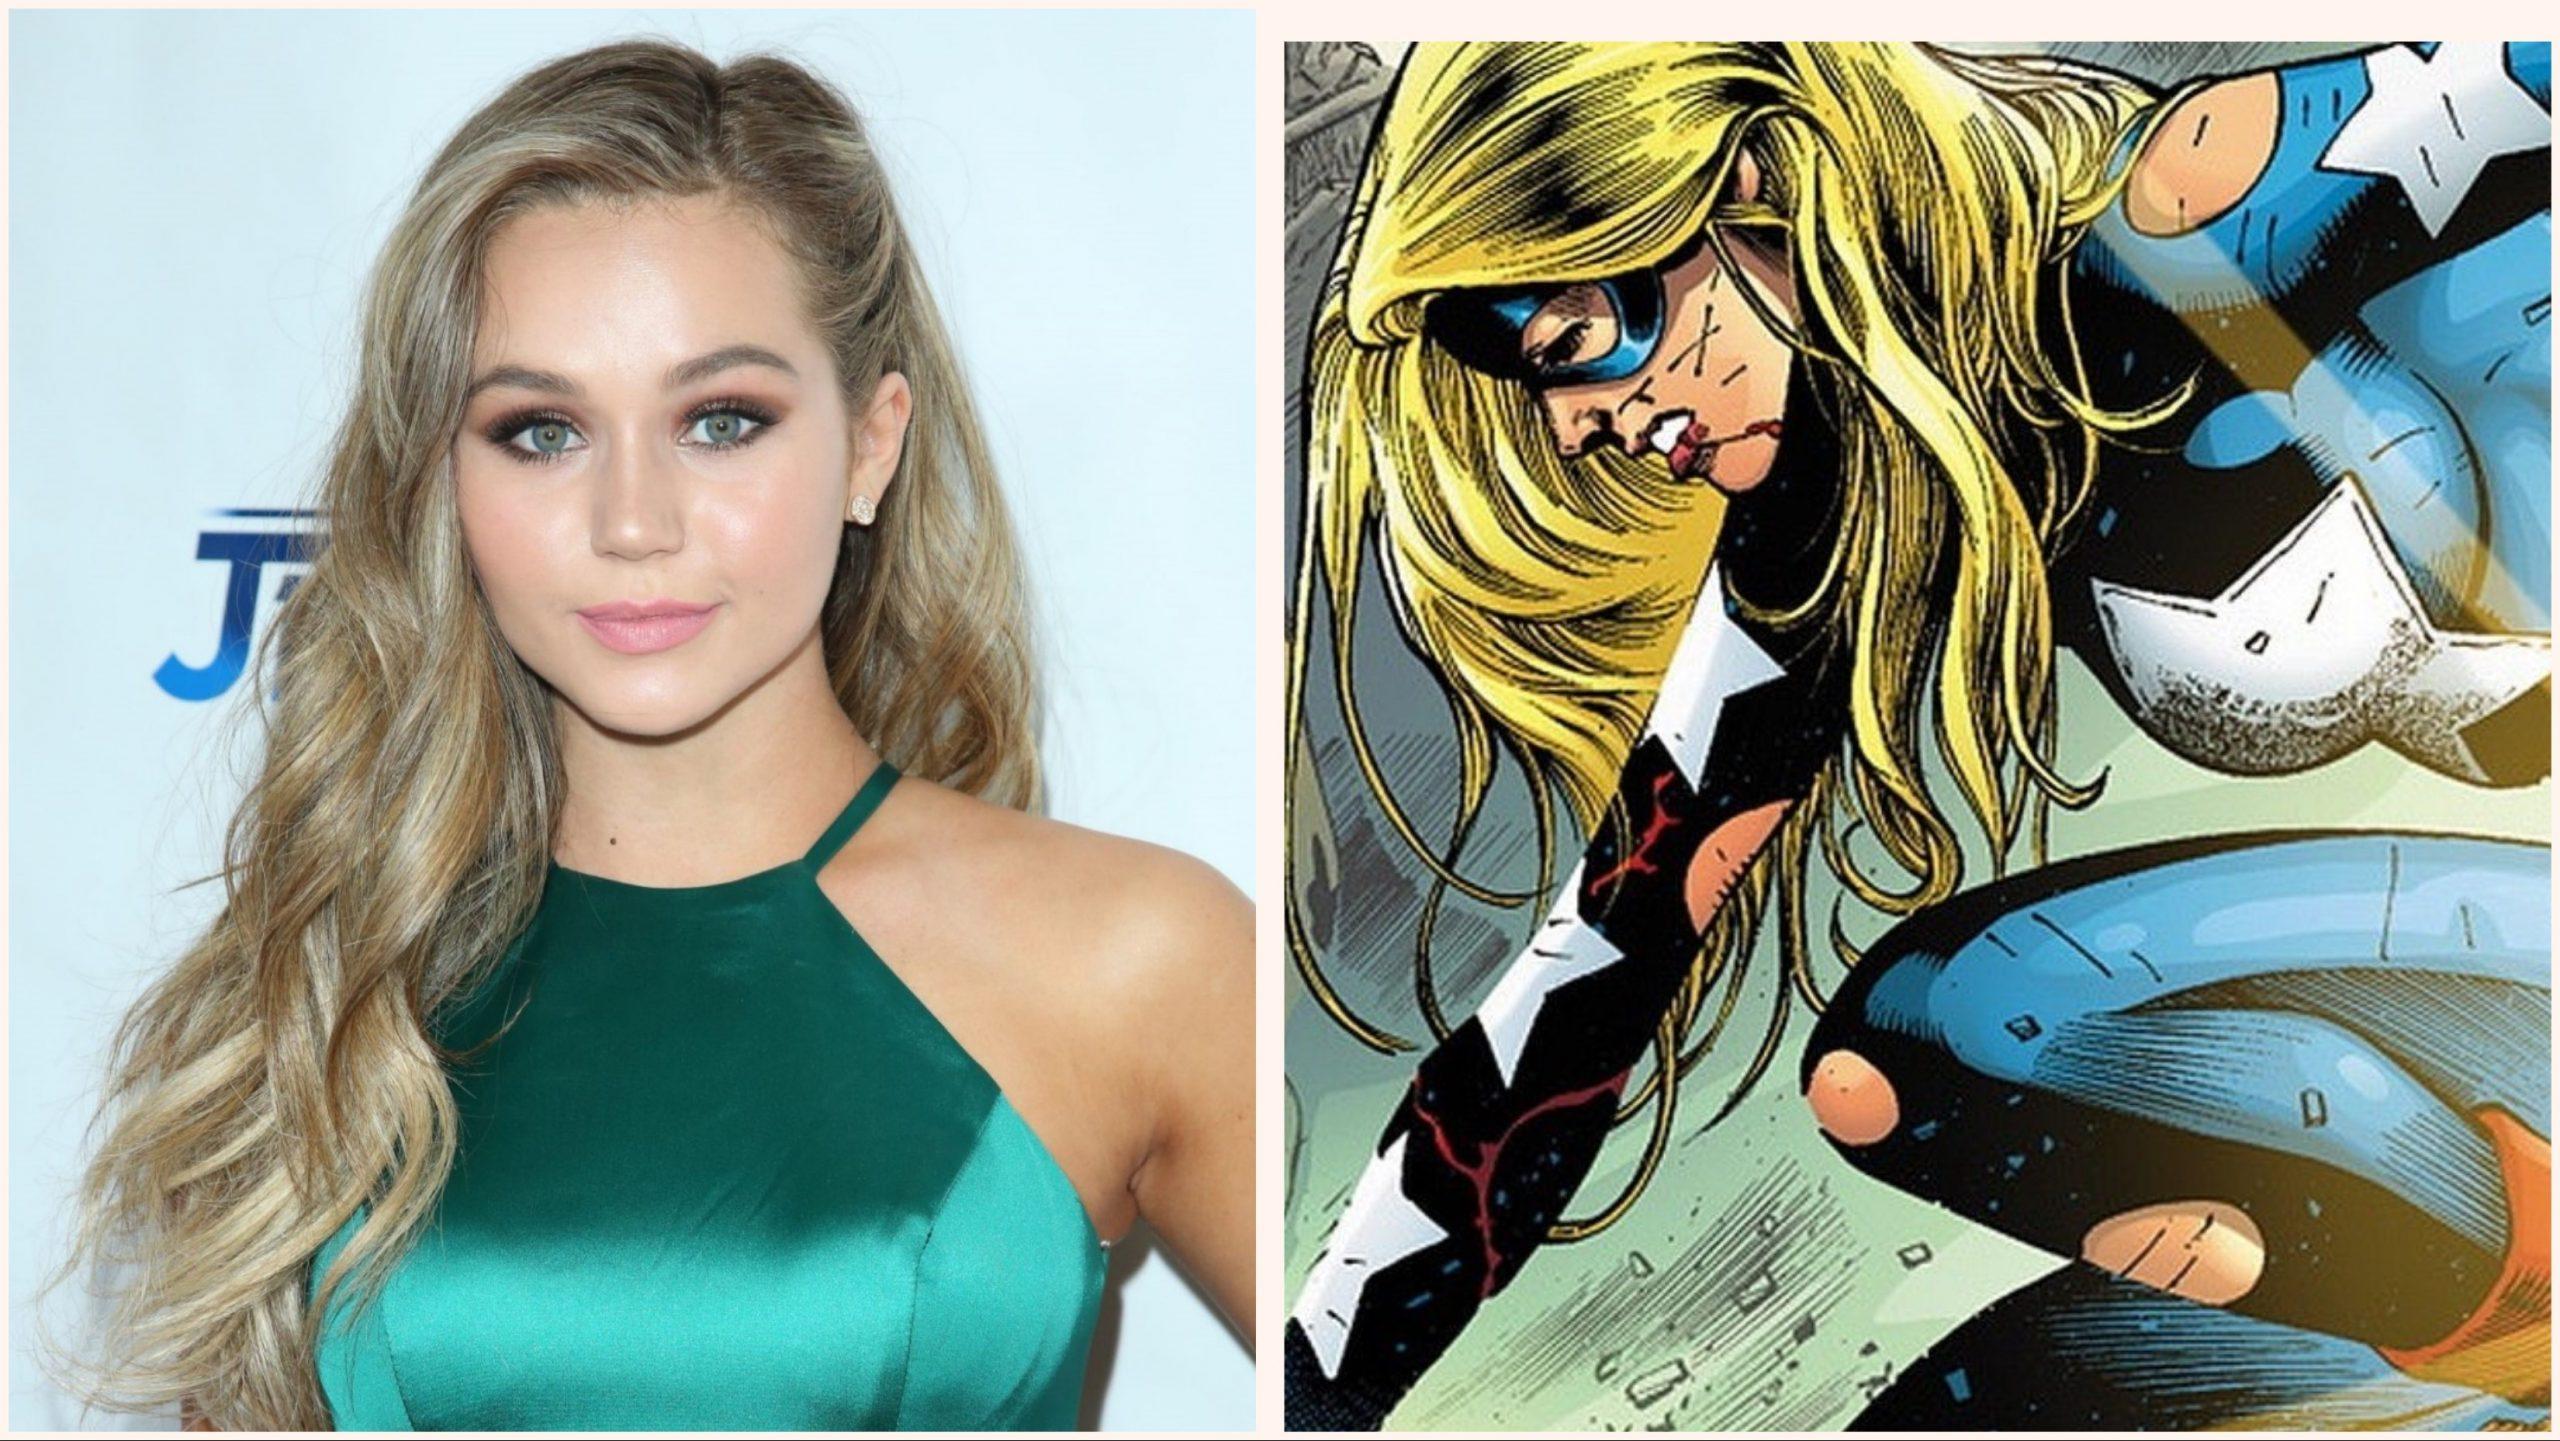 Brec Bassinger To Play DC Universe's 'Stargirl'